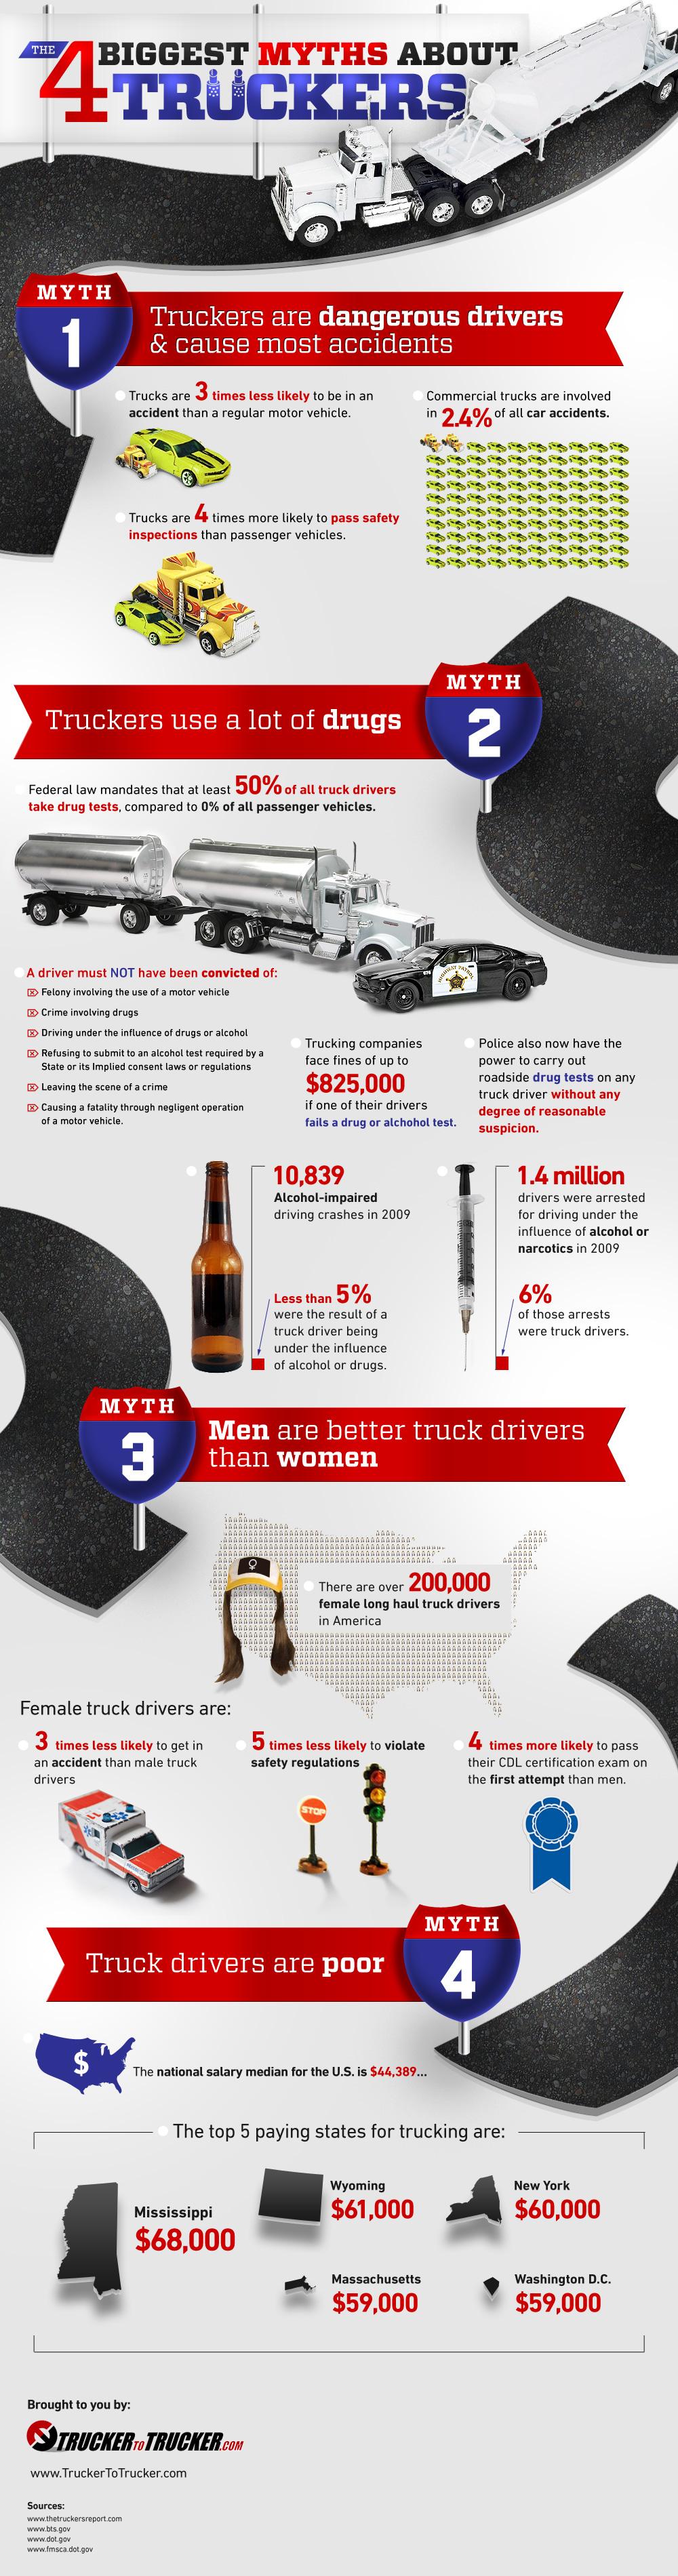 the american trucker - top trucker myths